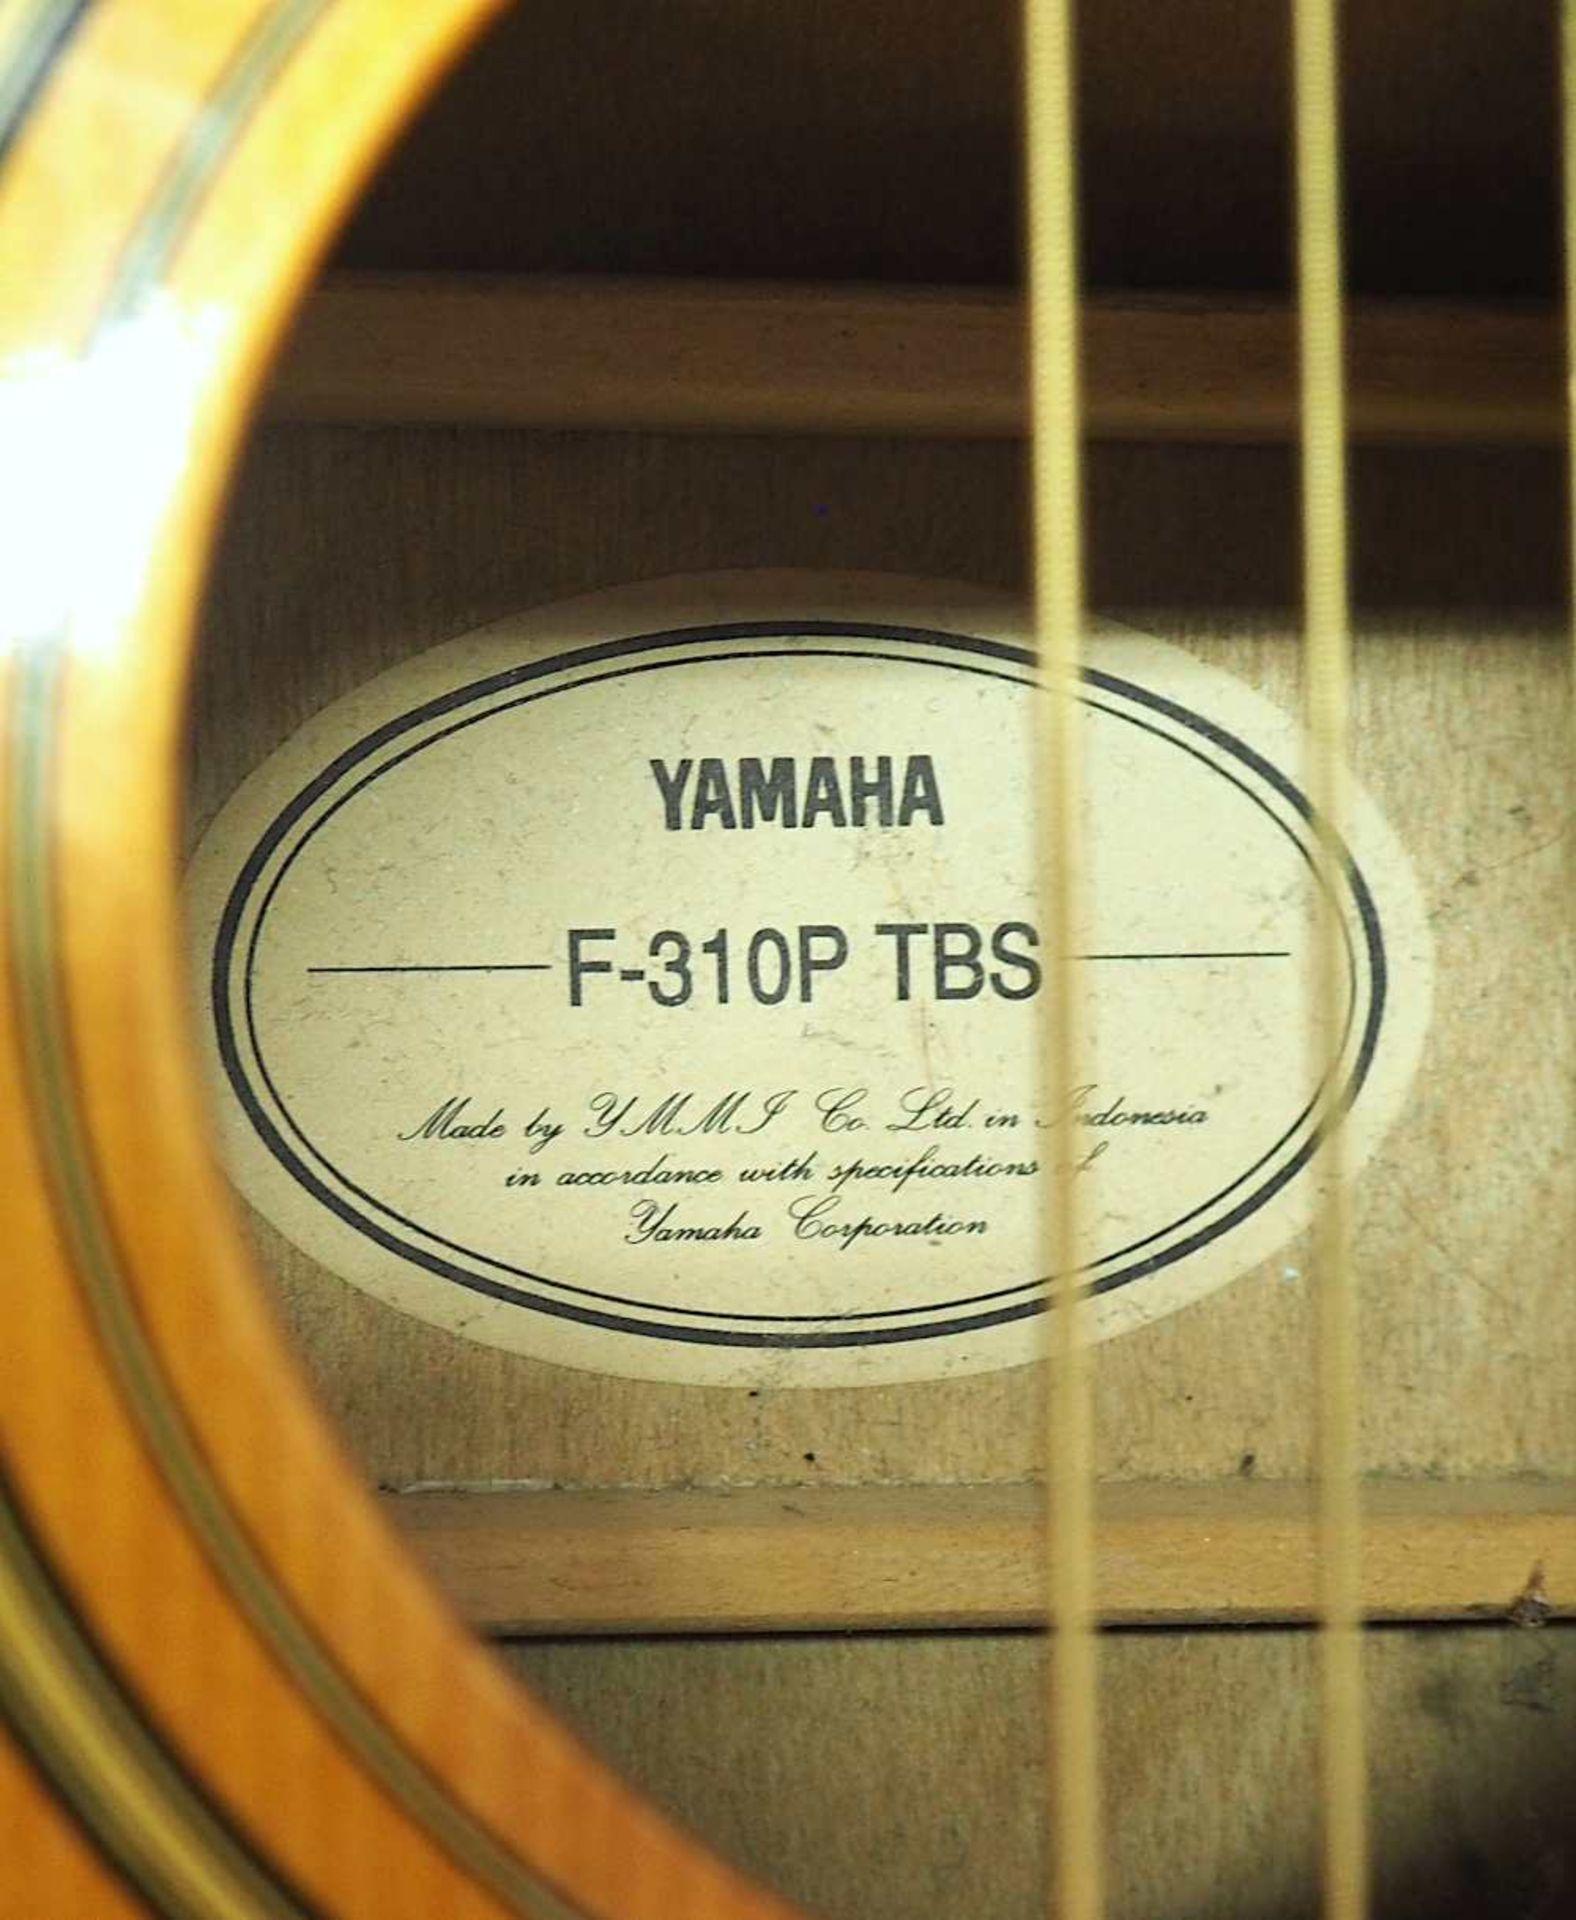 "1 Westerngitarre YAMAHA Modell: ""F-310P TBS, YMMJ Co. Ldt.,"" Indonesien Holzkorpus mit - Bild 5 aus 6"